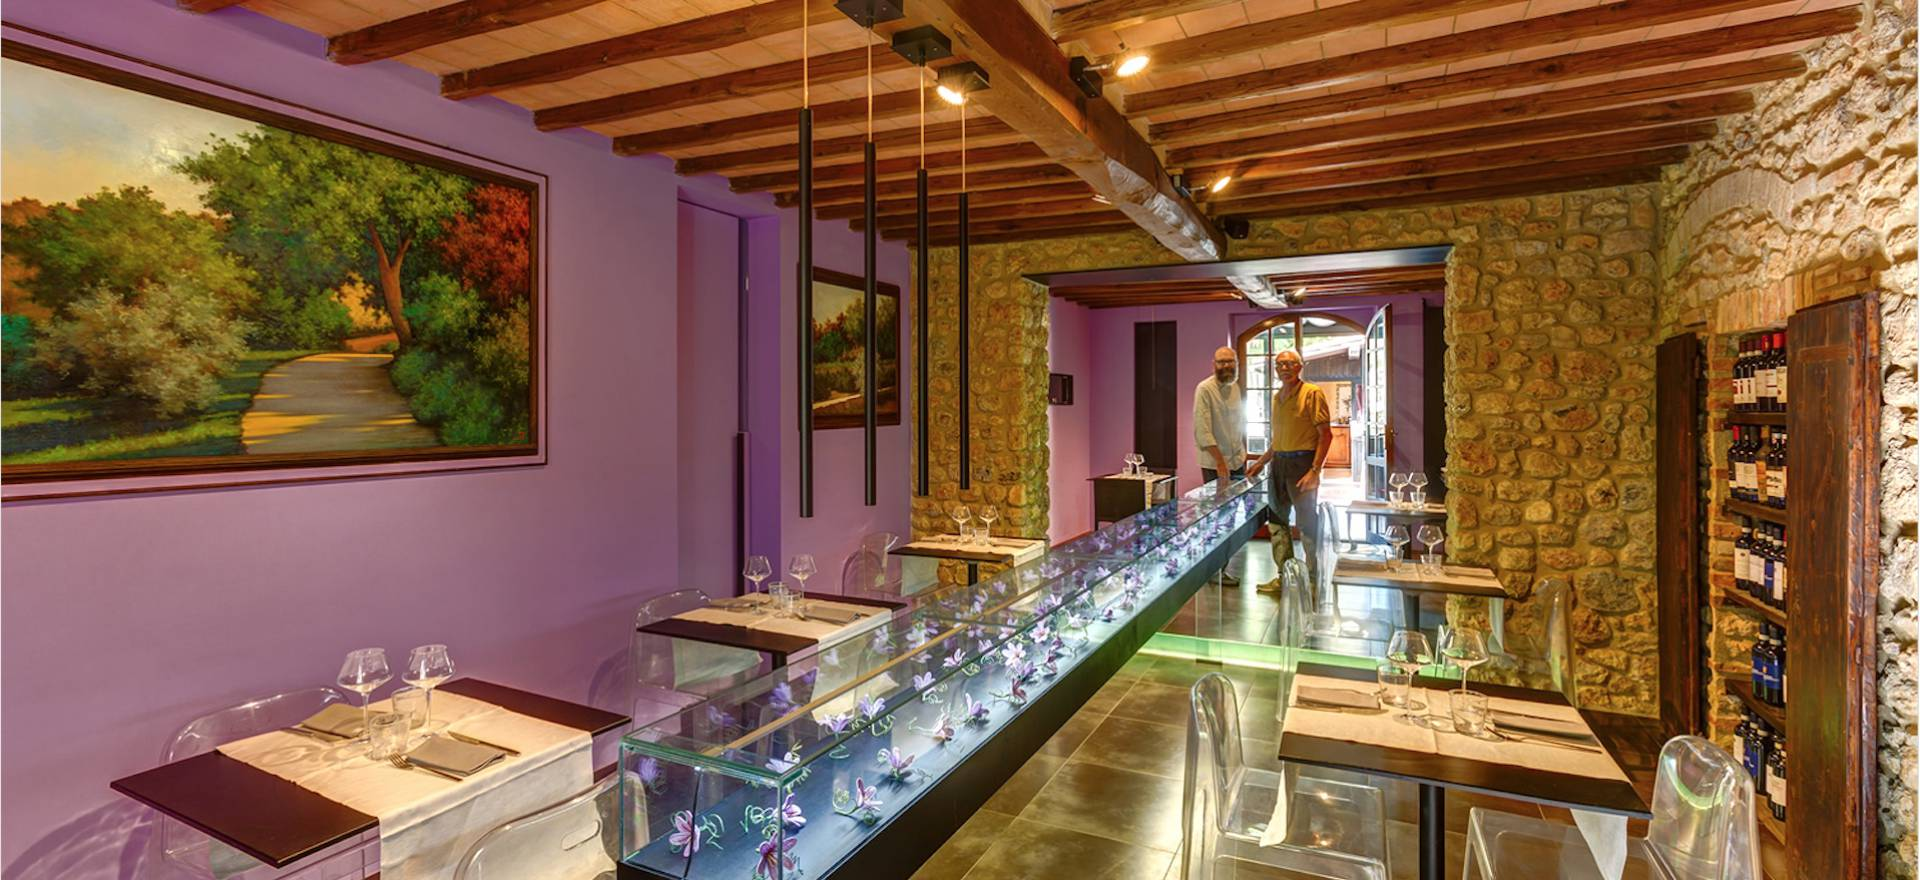 Agriturismo Toscane Agriturismo met restaurant bij San Gimignano, Toscane